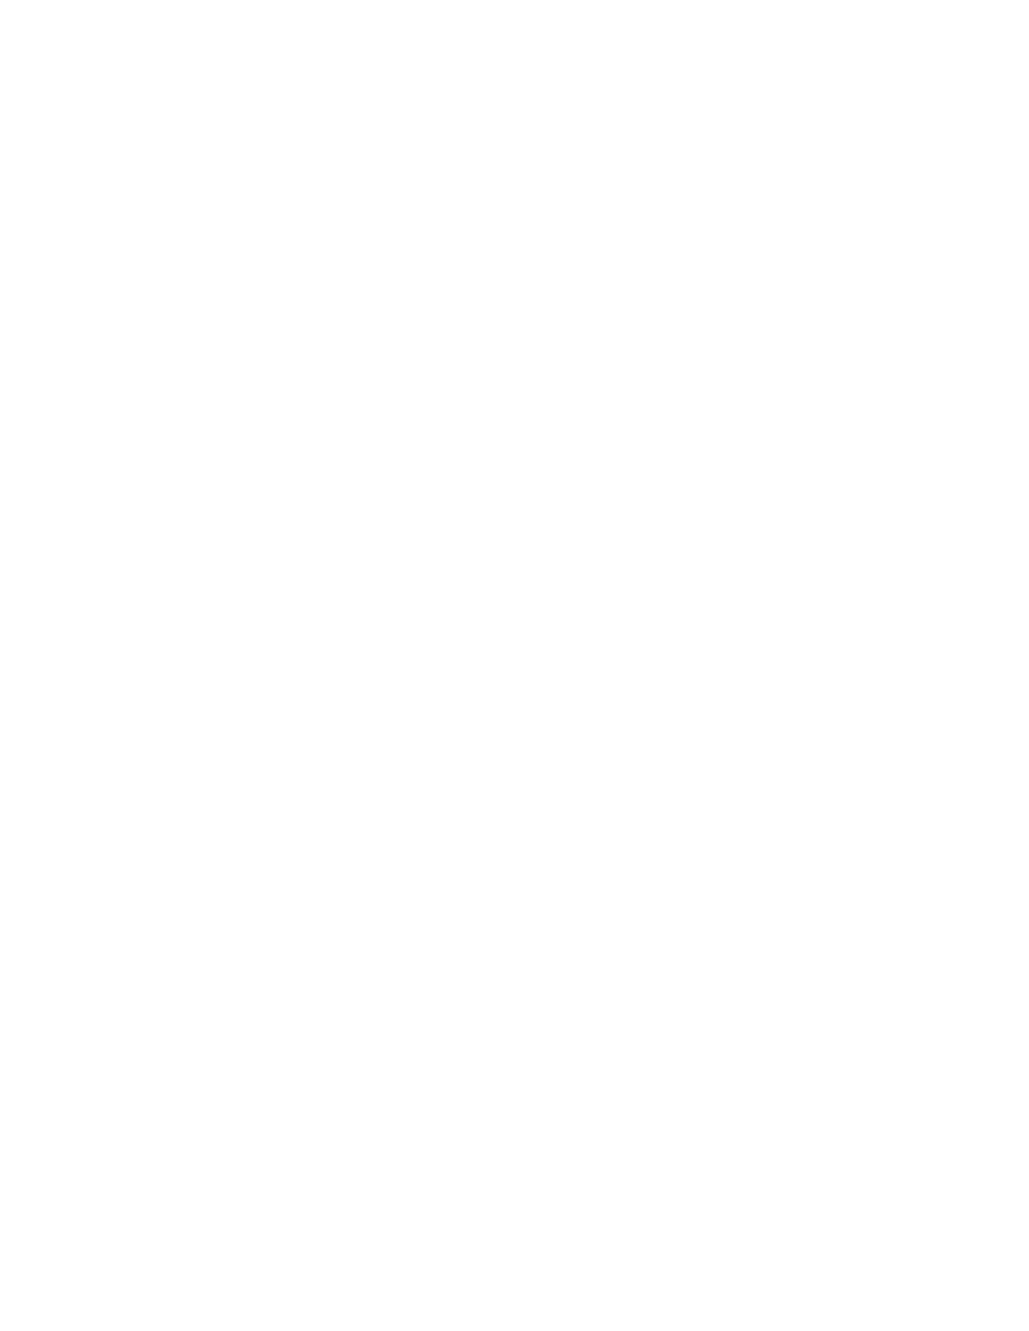 Bakeshop/Cafe Logo Contest